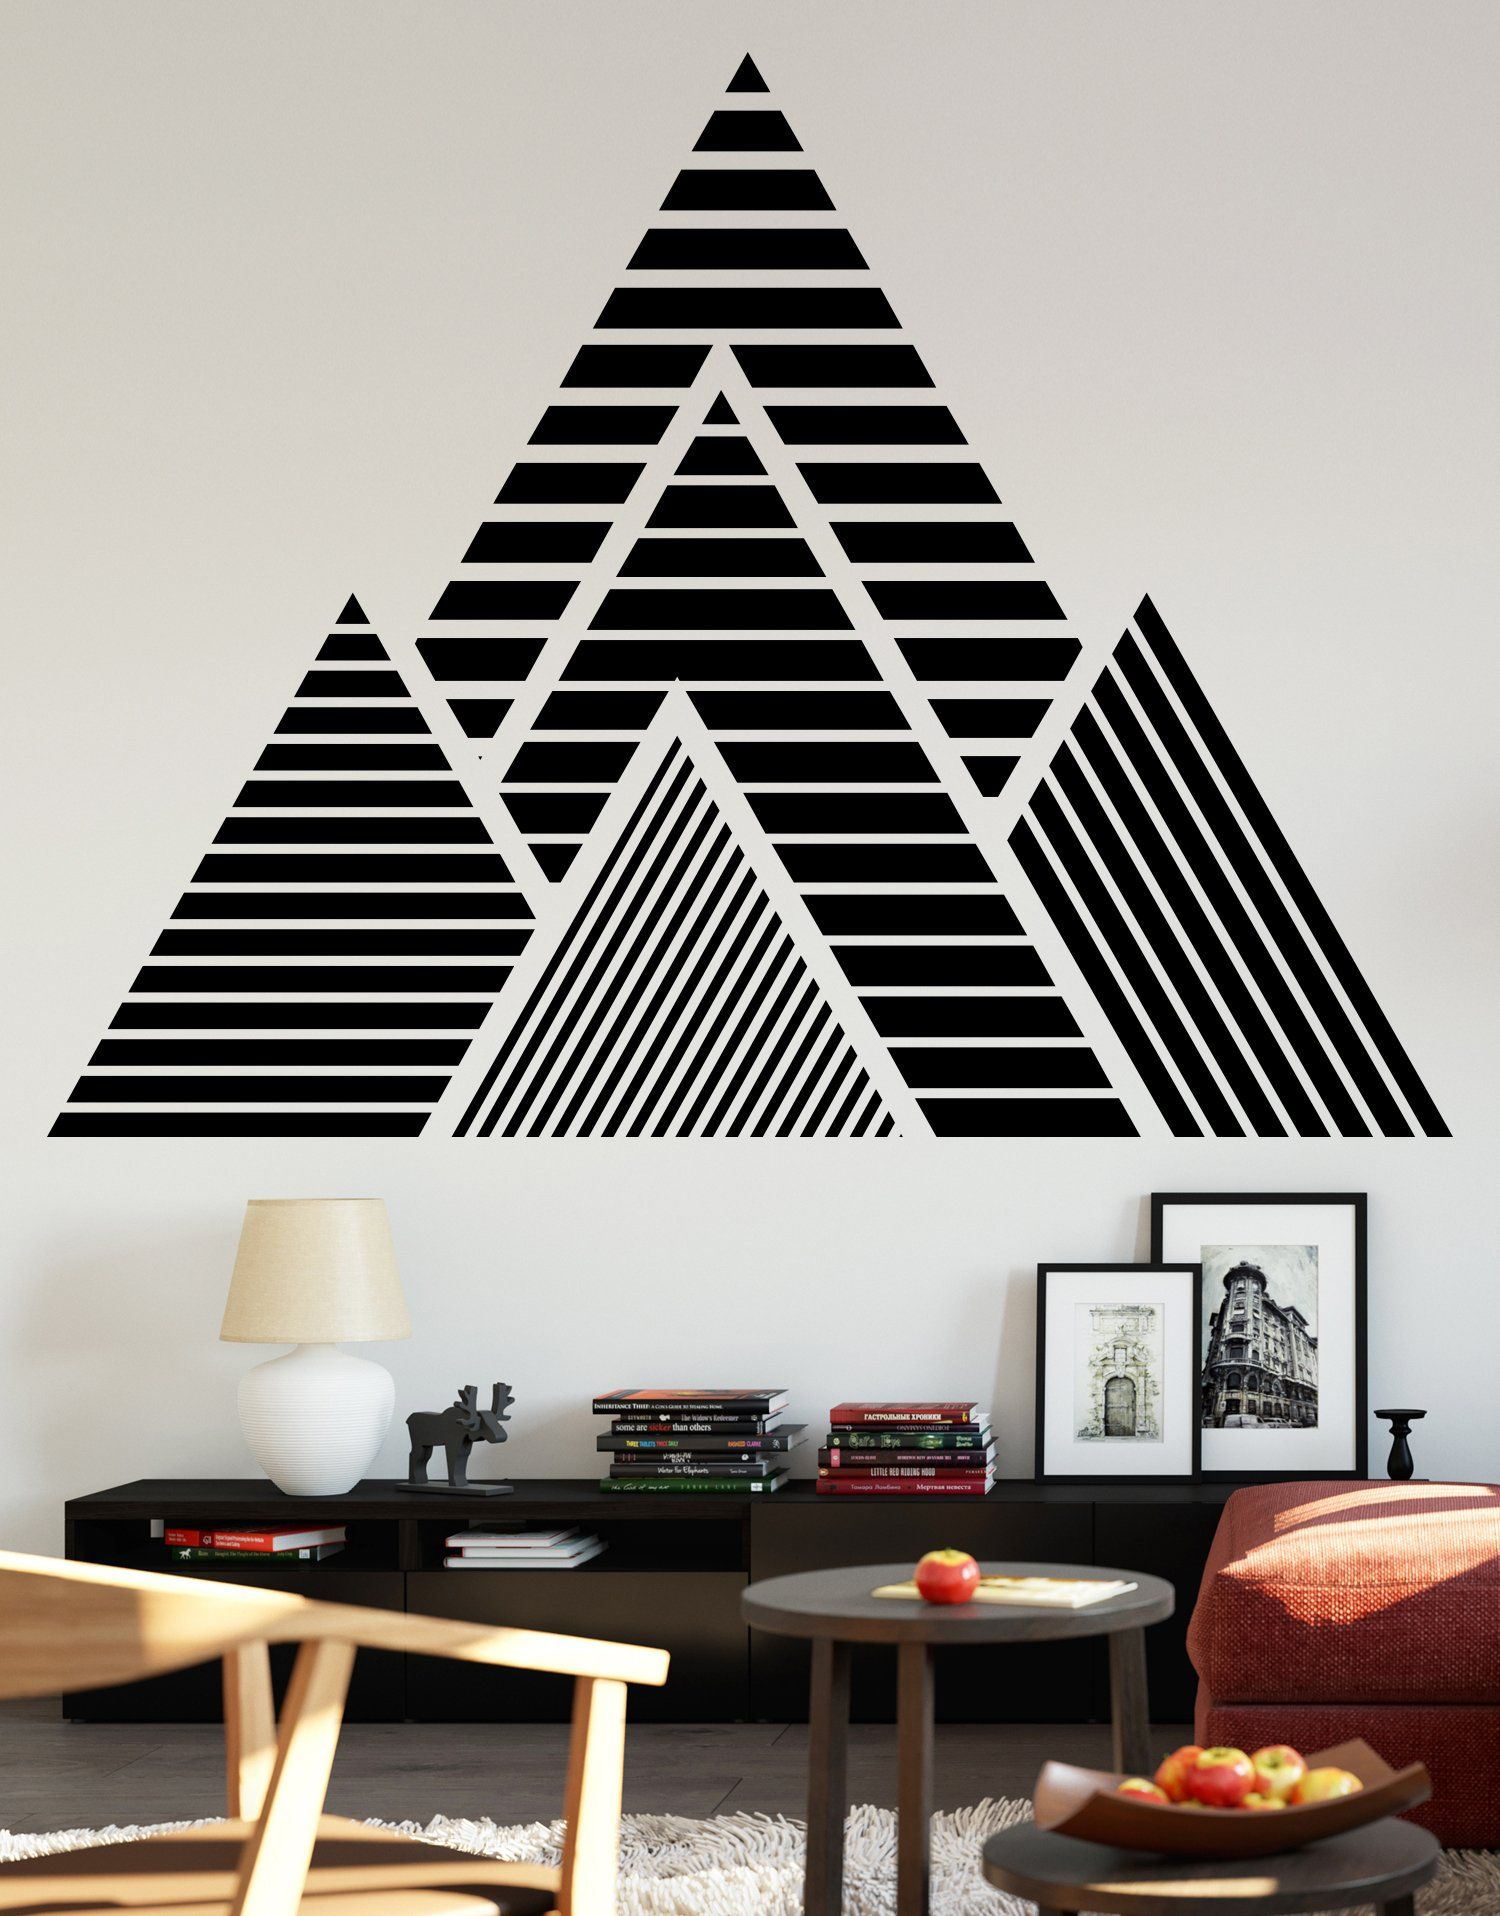 Mountain Wall Sticker Mountain Vinyl Wall Decal Tape Wall Art Wall Decor Design Vinyl Wall Decals